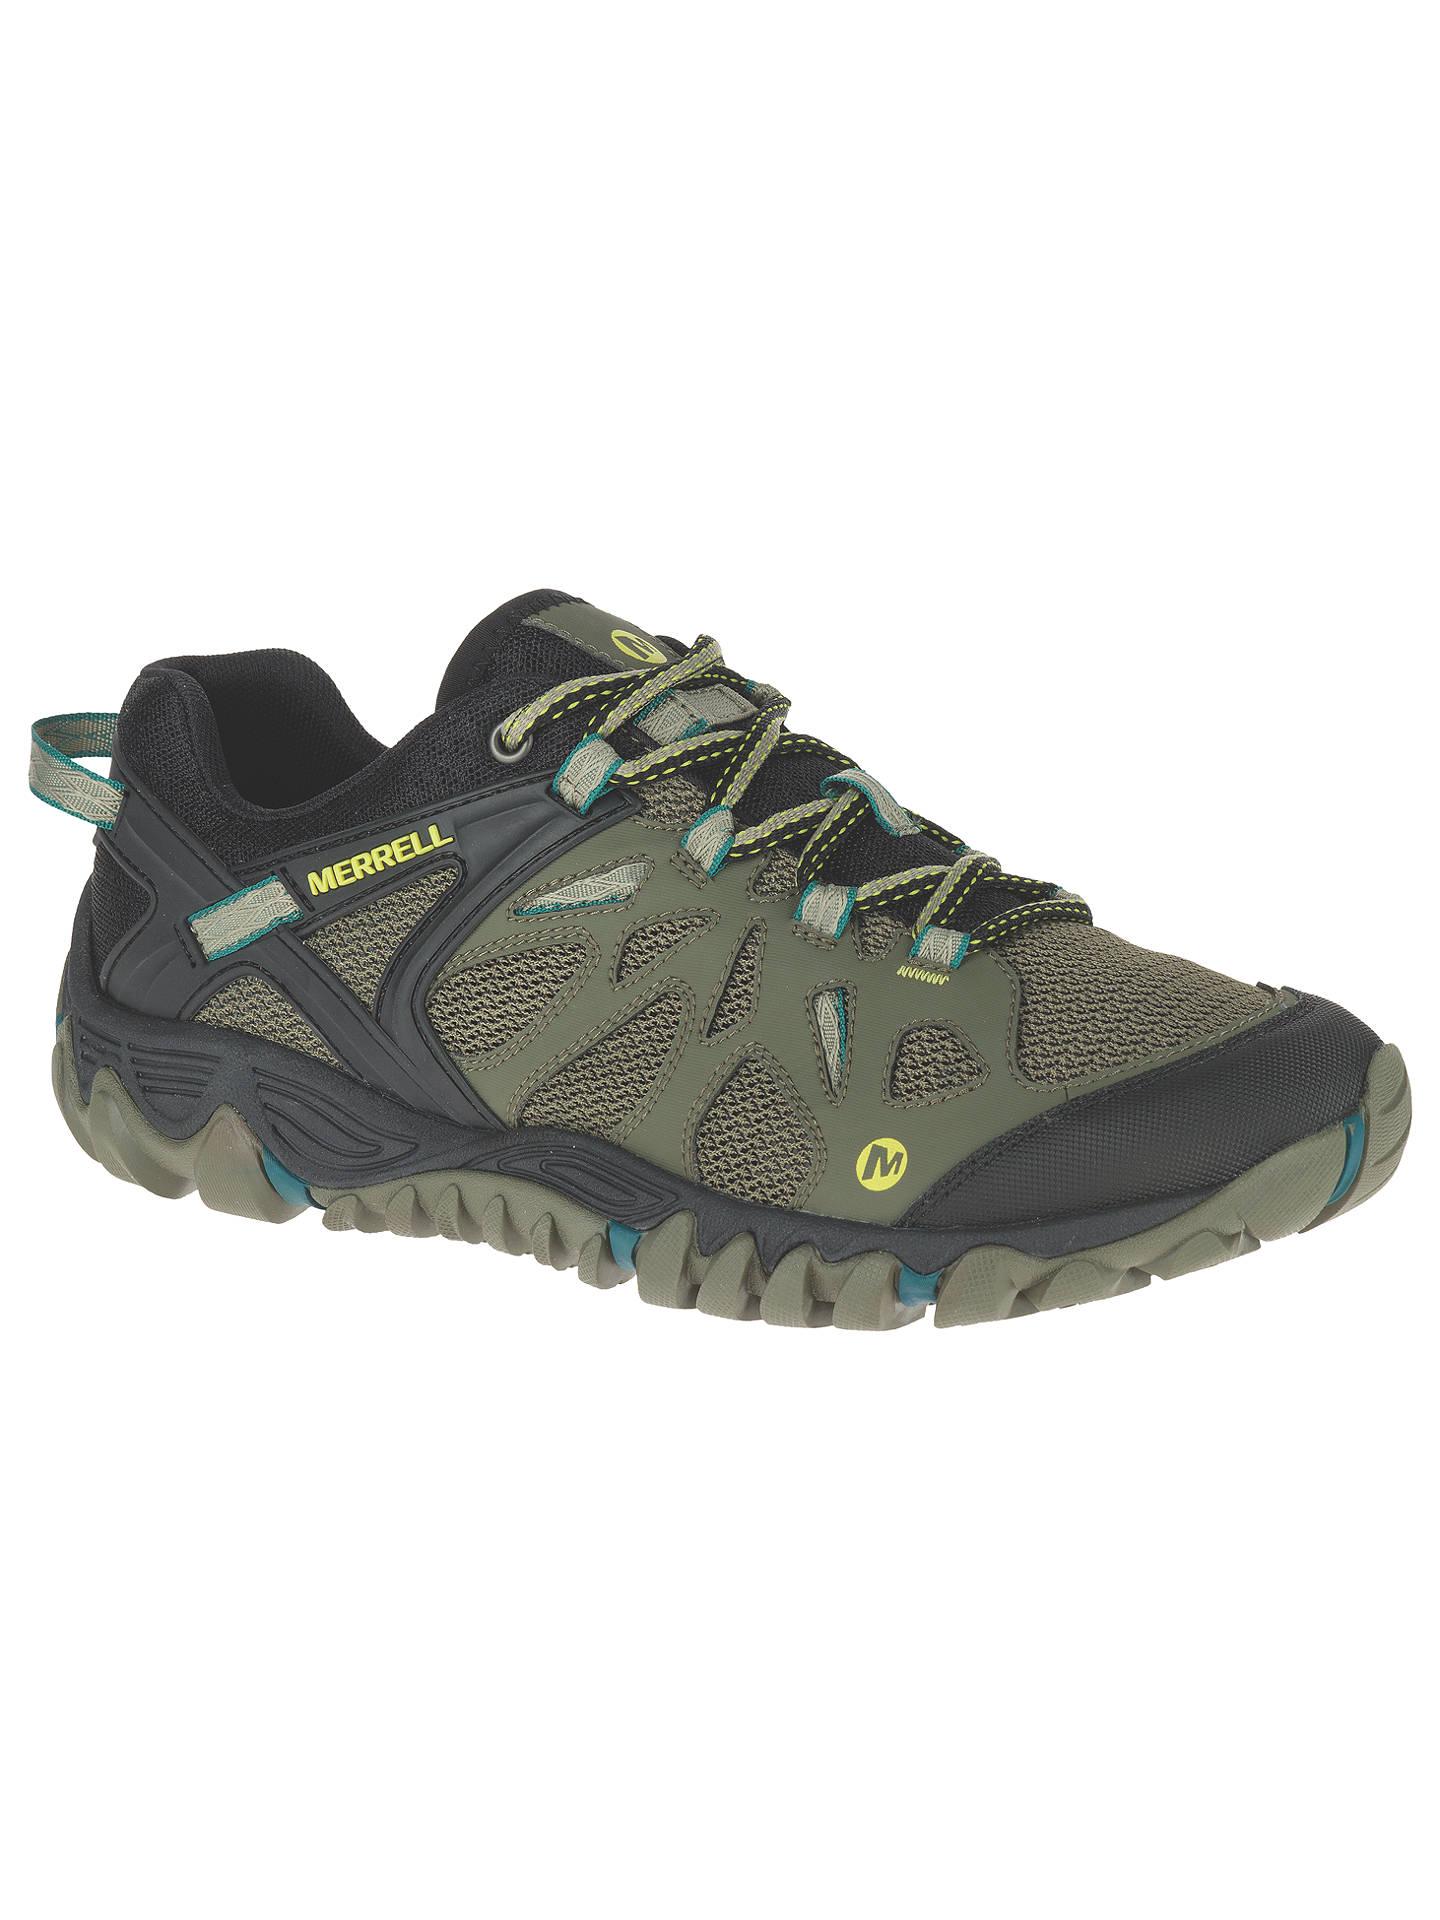 18e0d1f83113 Buy Merrell All Out Blaze Aero Sport Men s Walking Shoes